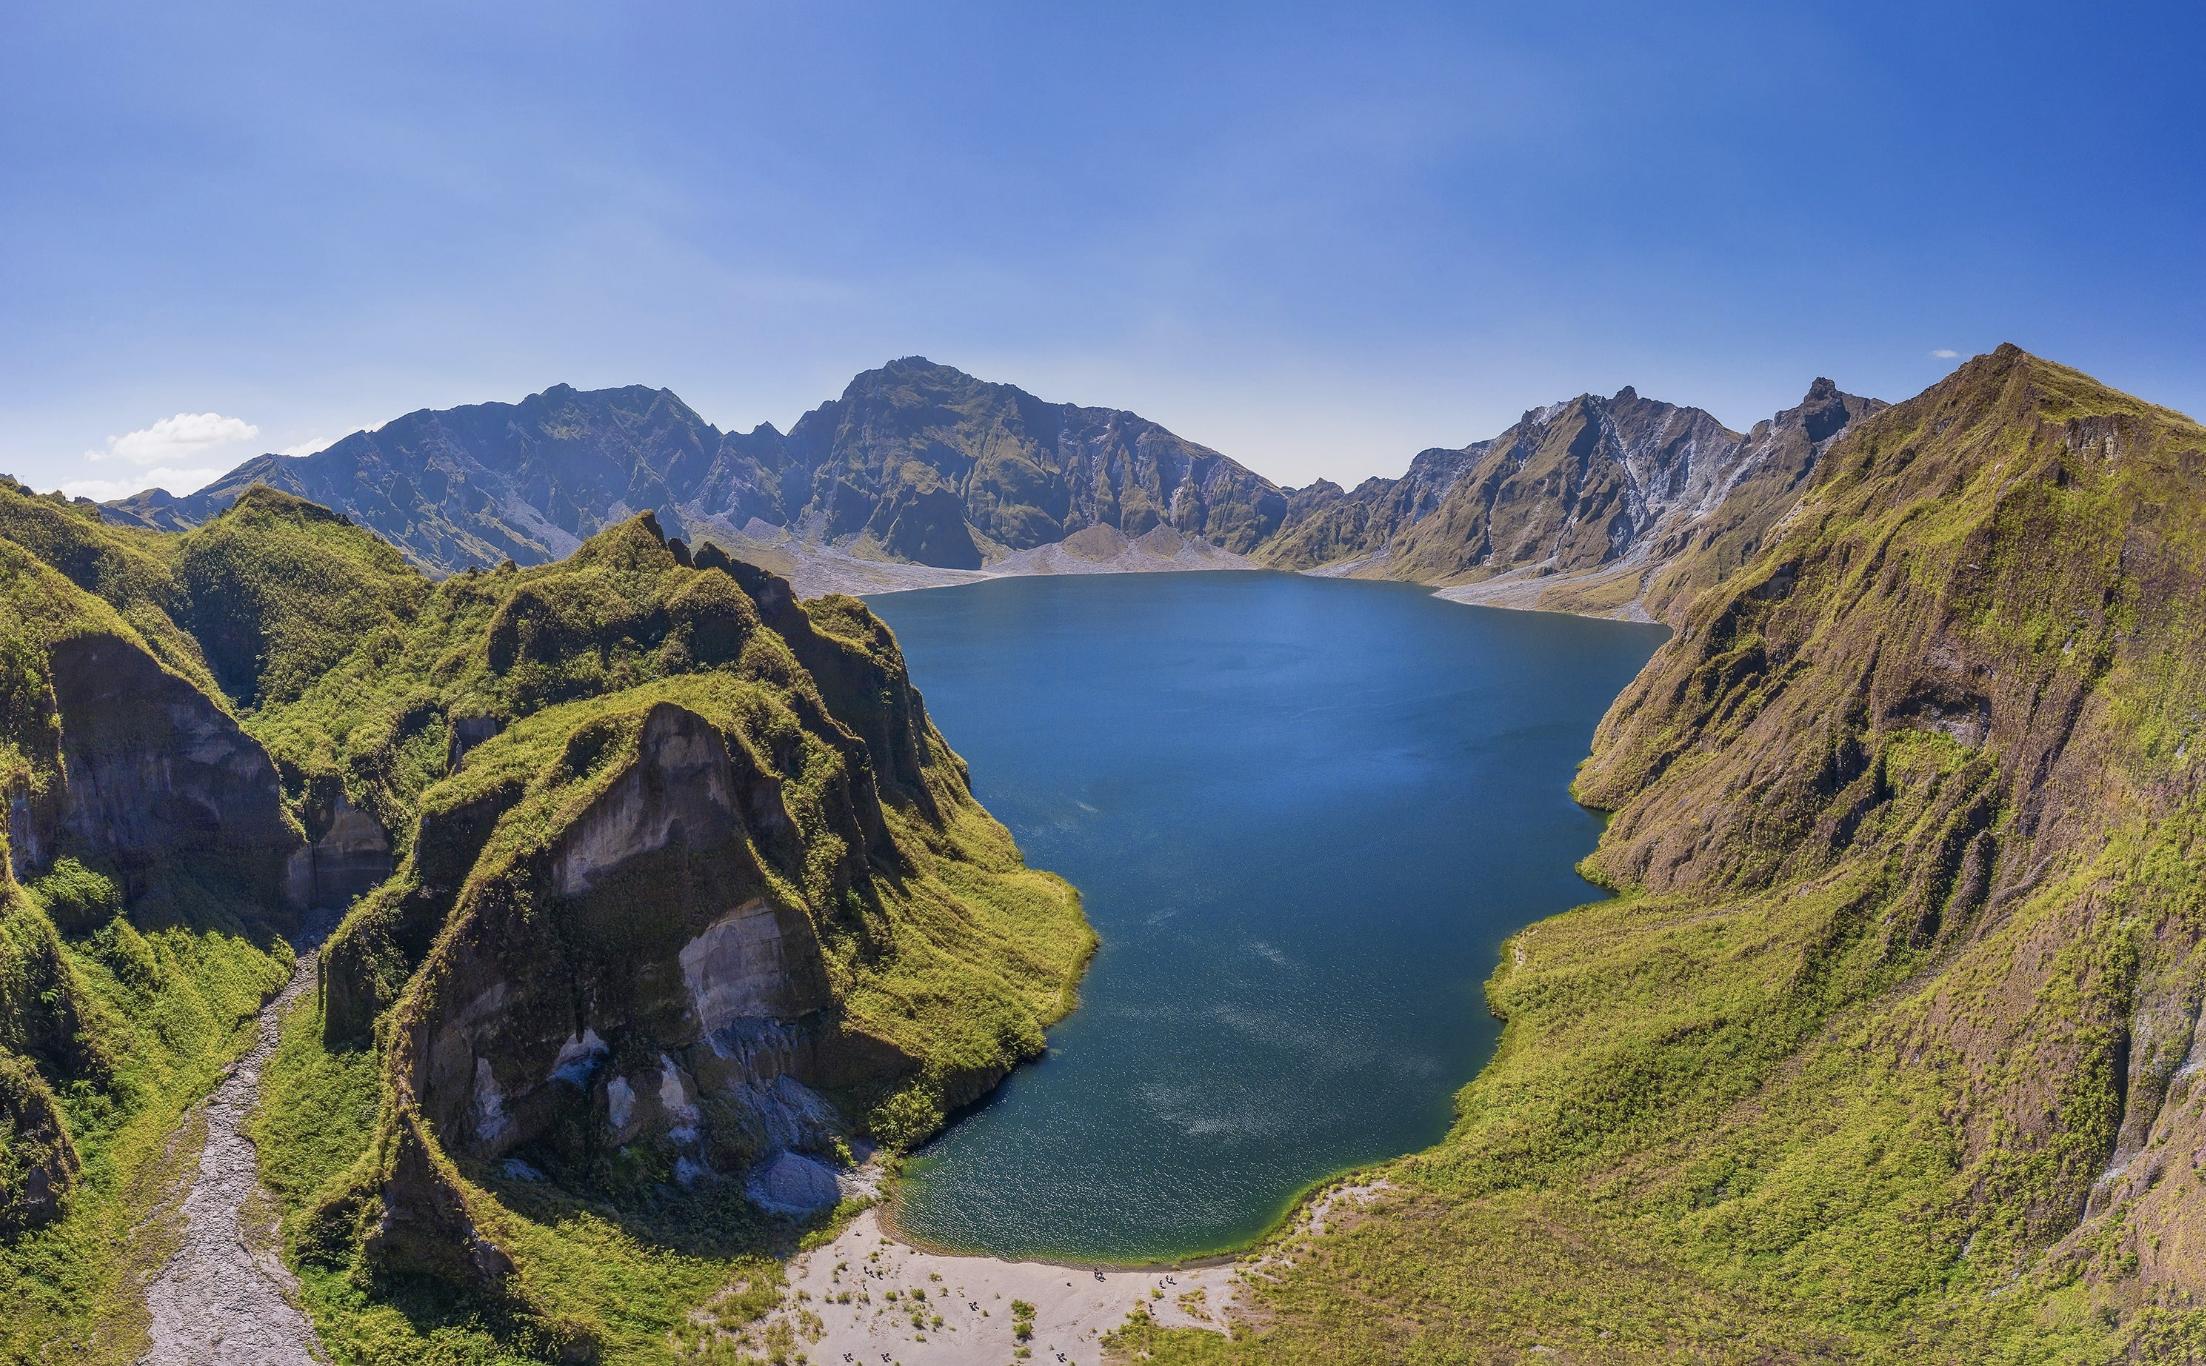 Beautiful crater lake of Mt. Pinatubo